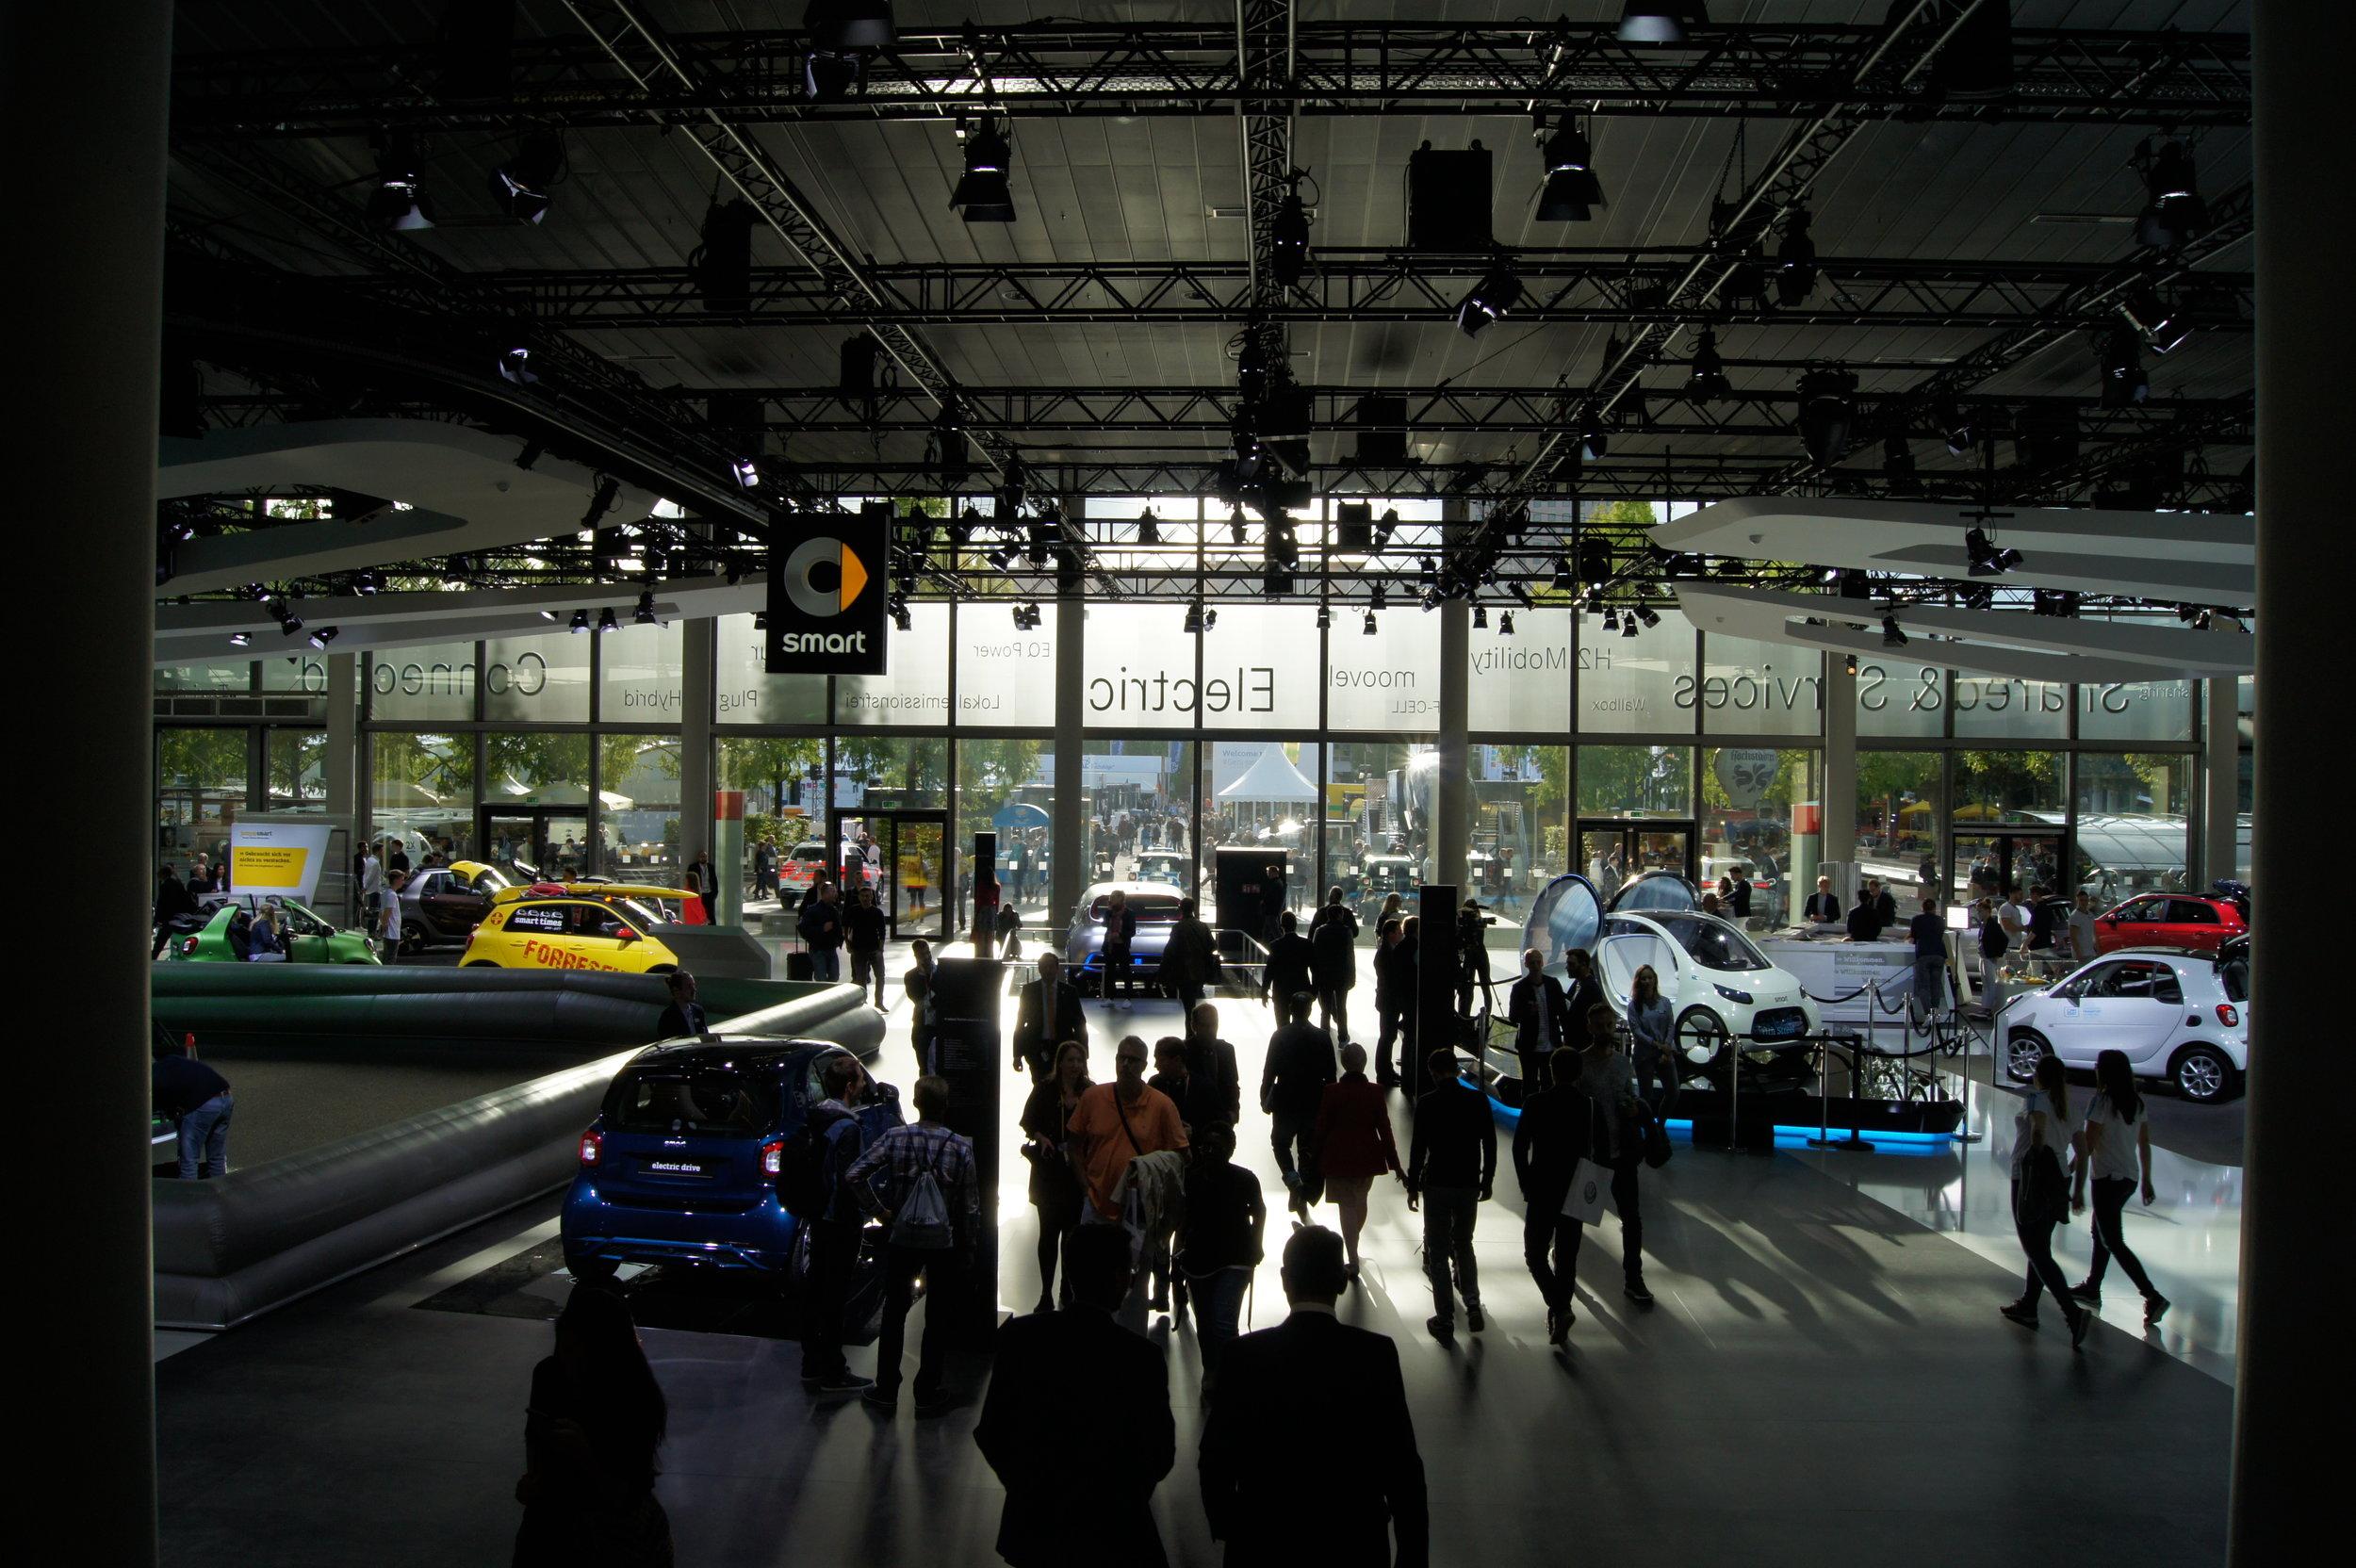 Take advantage of the benefits electric and semi-autonomous vehicles